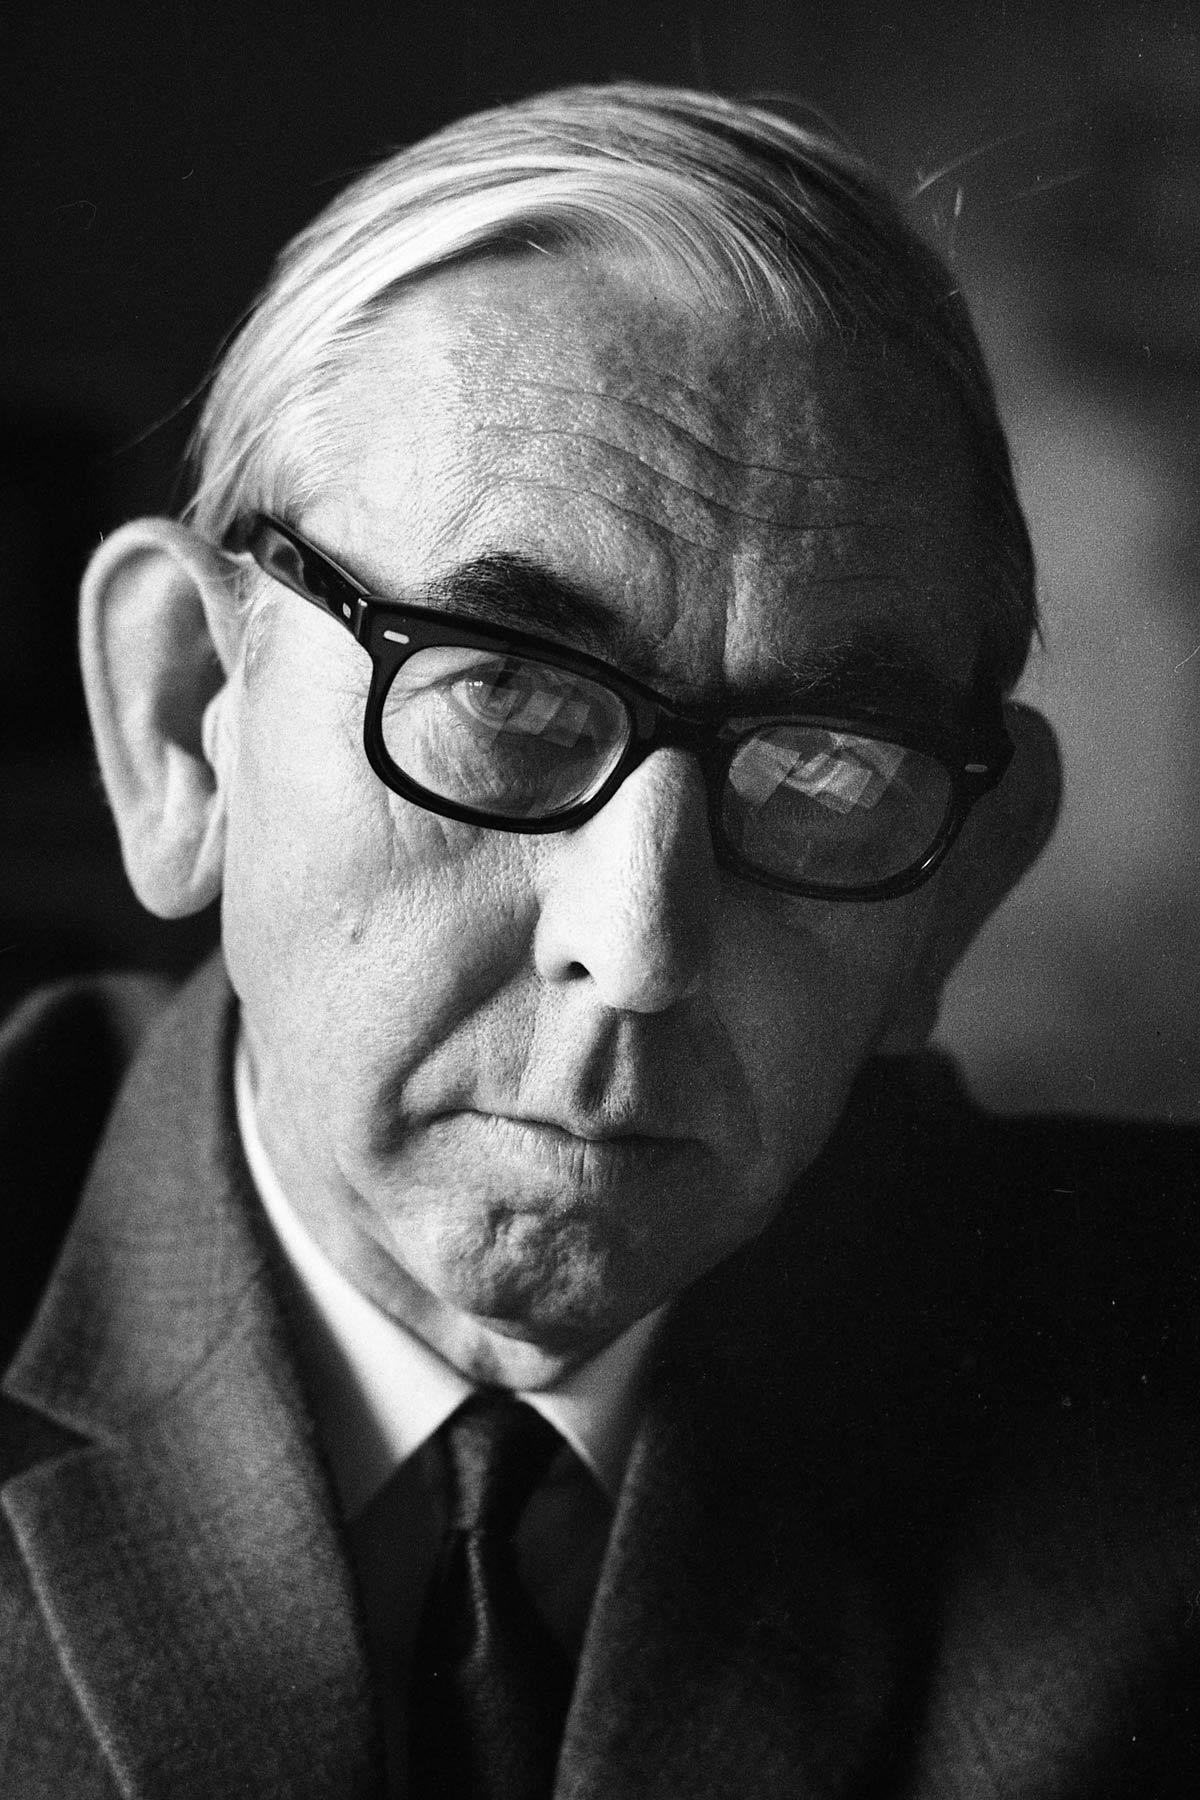 Hans Lidman författaren